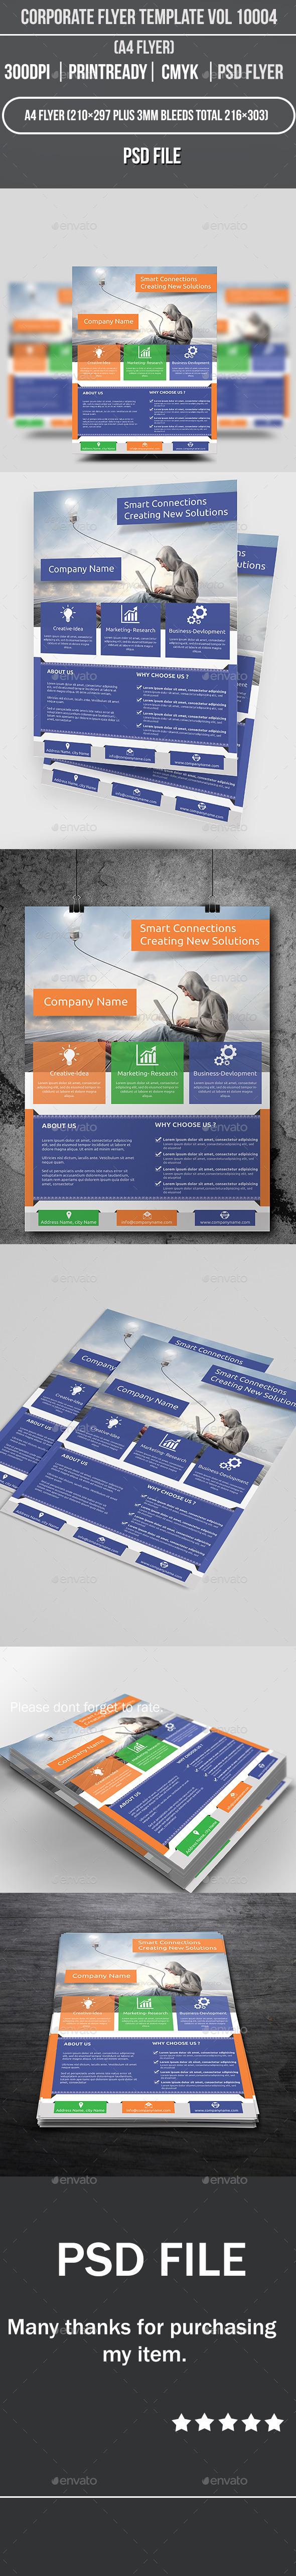 GraphicRiver Corporate Flyer Template Vol 10004 9025589